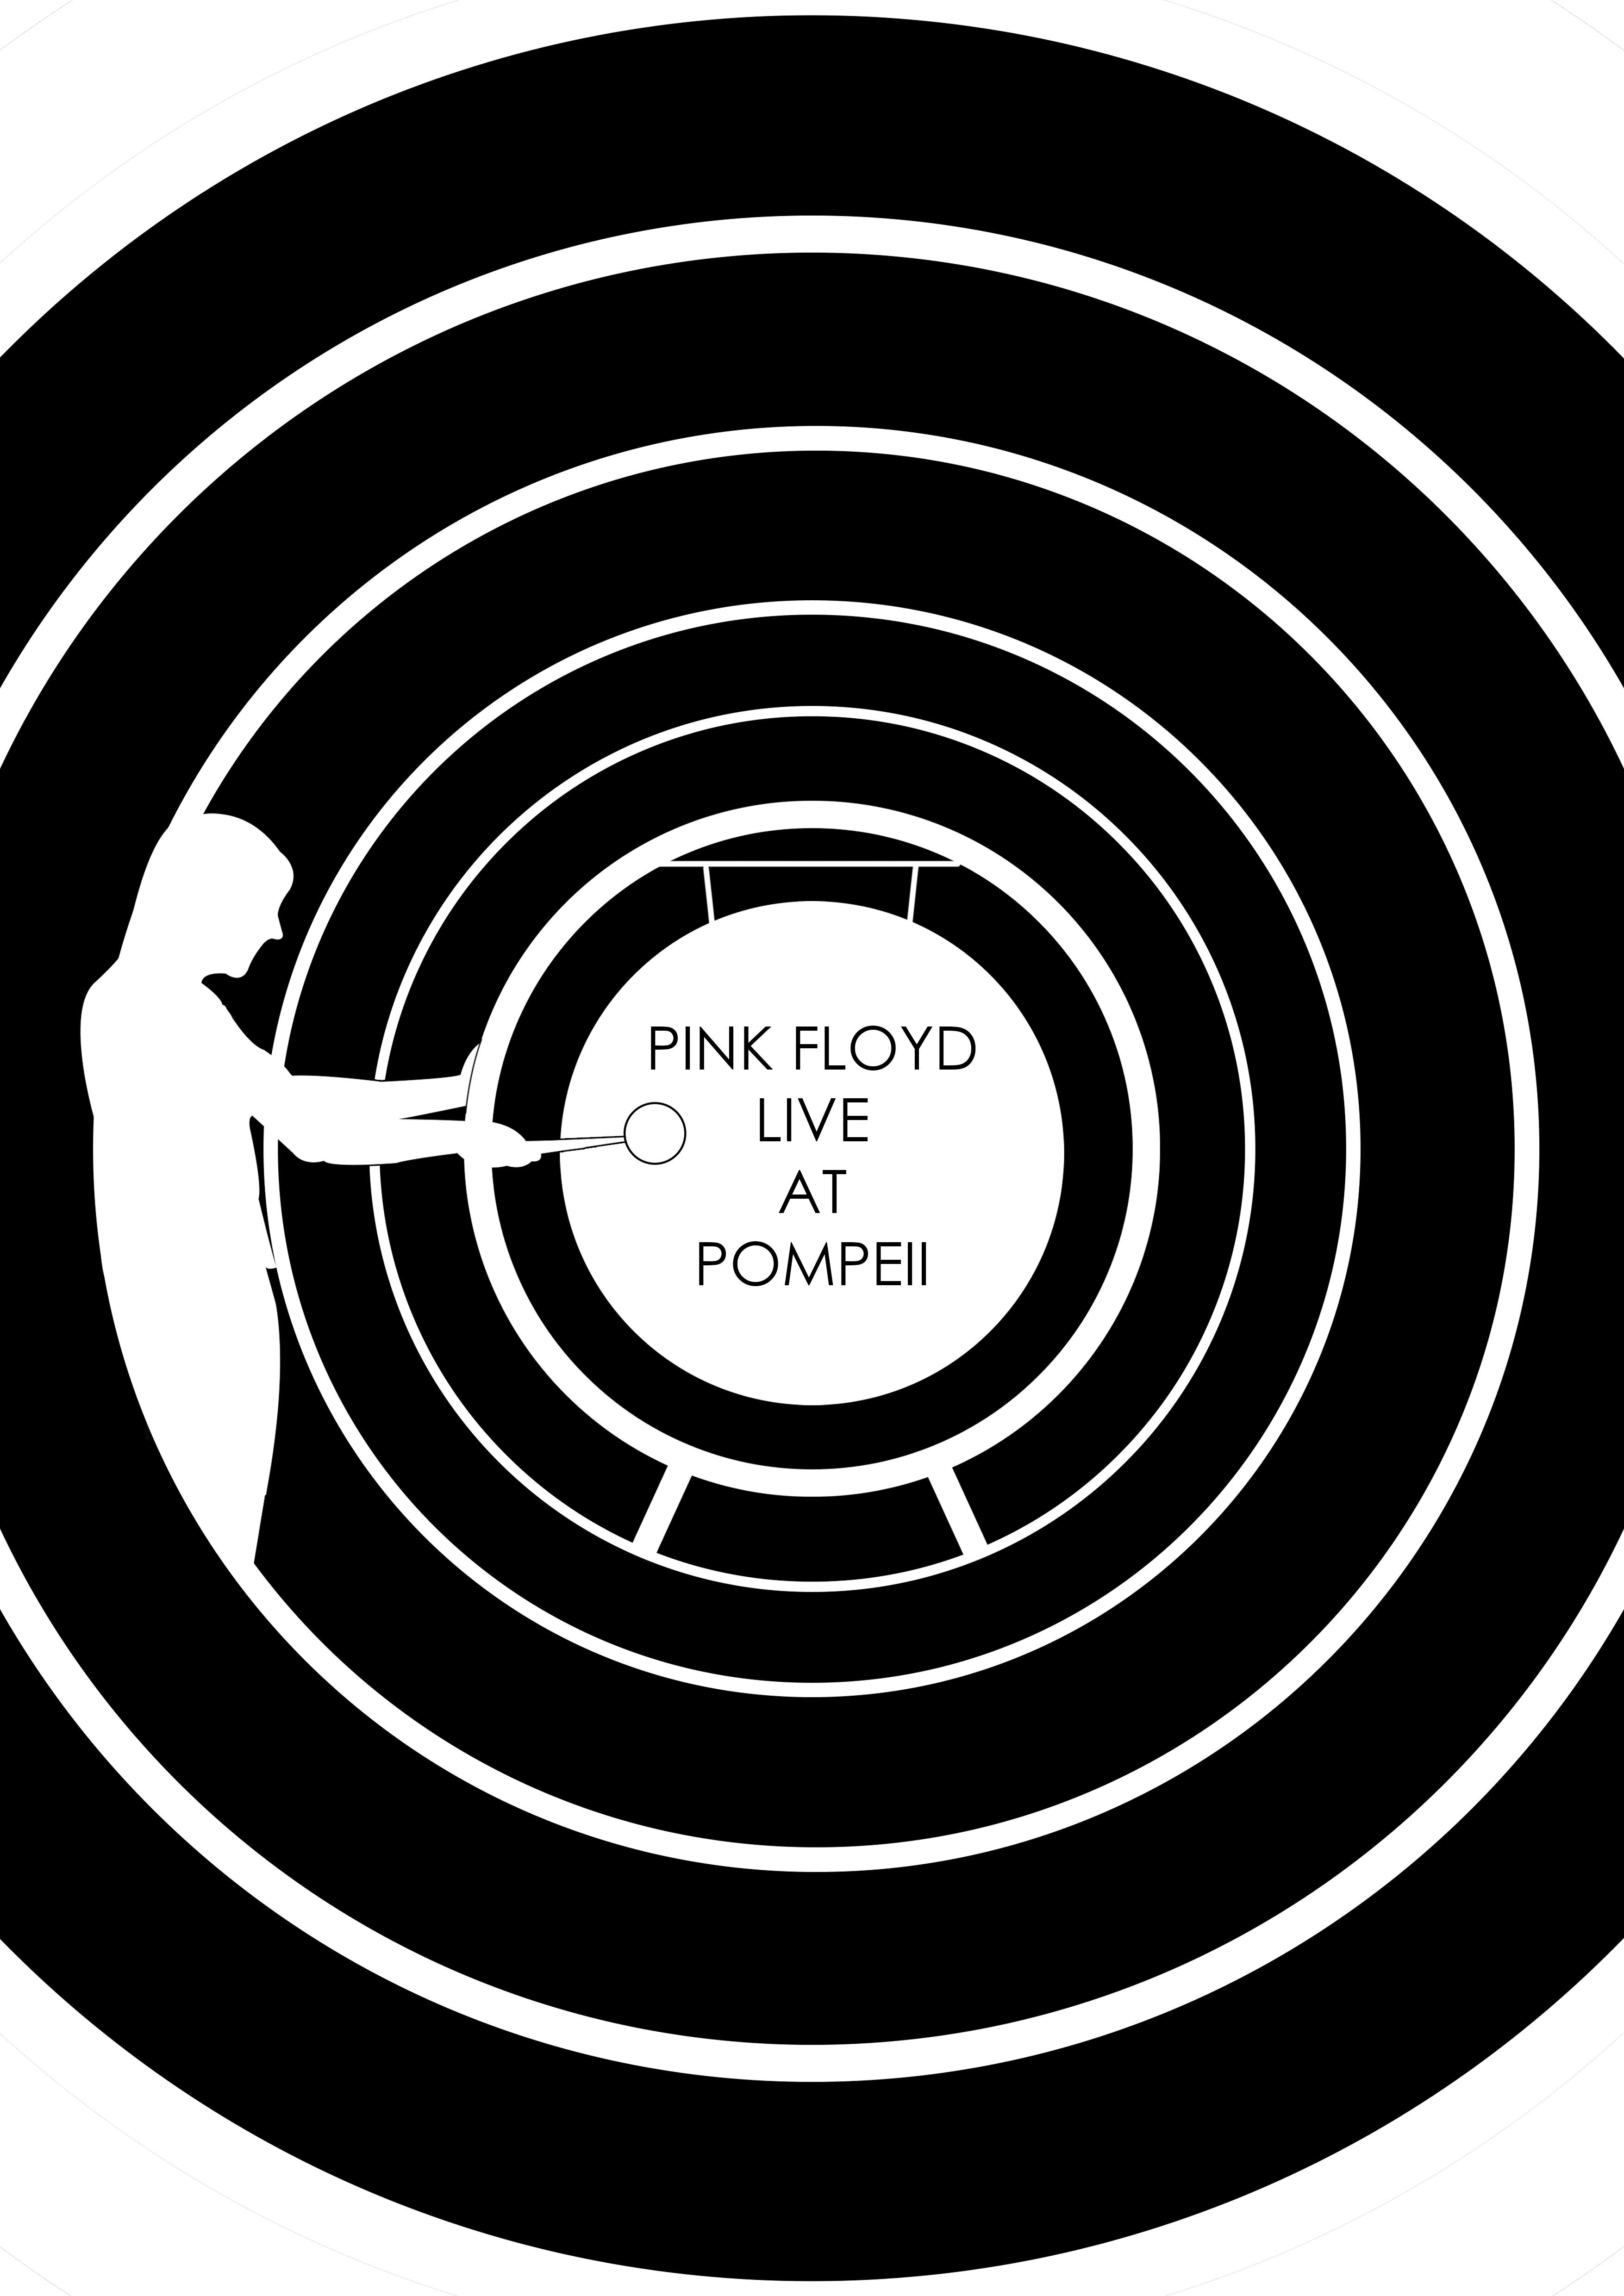 Pink Floyd Live At Pompeii by Basolian on DeviantArt